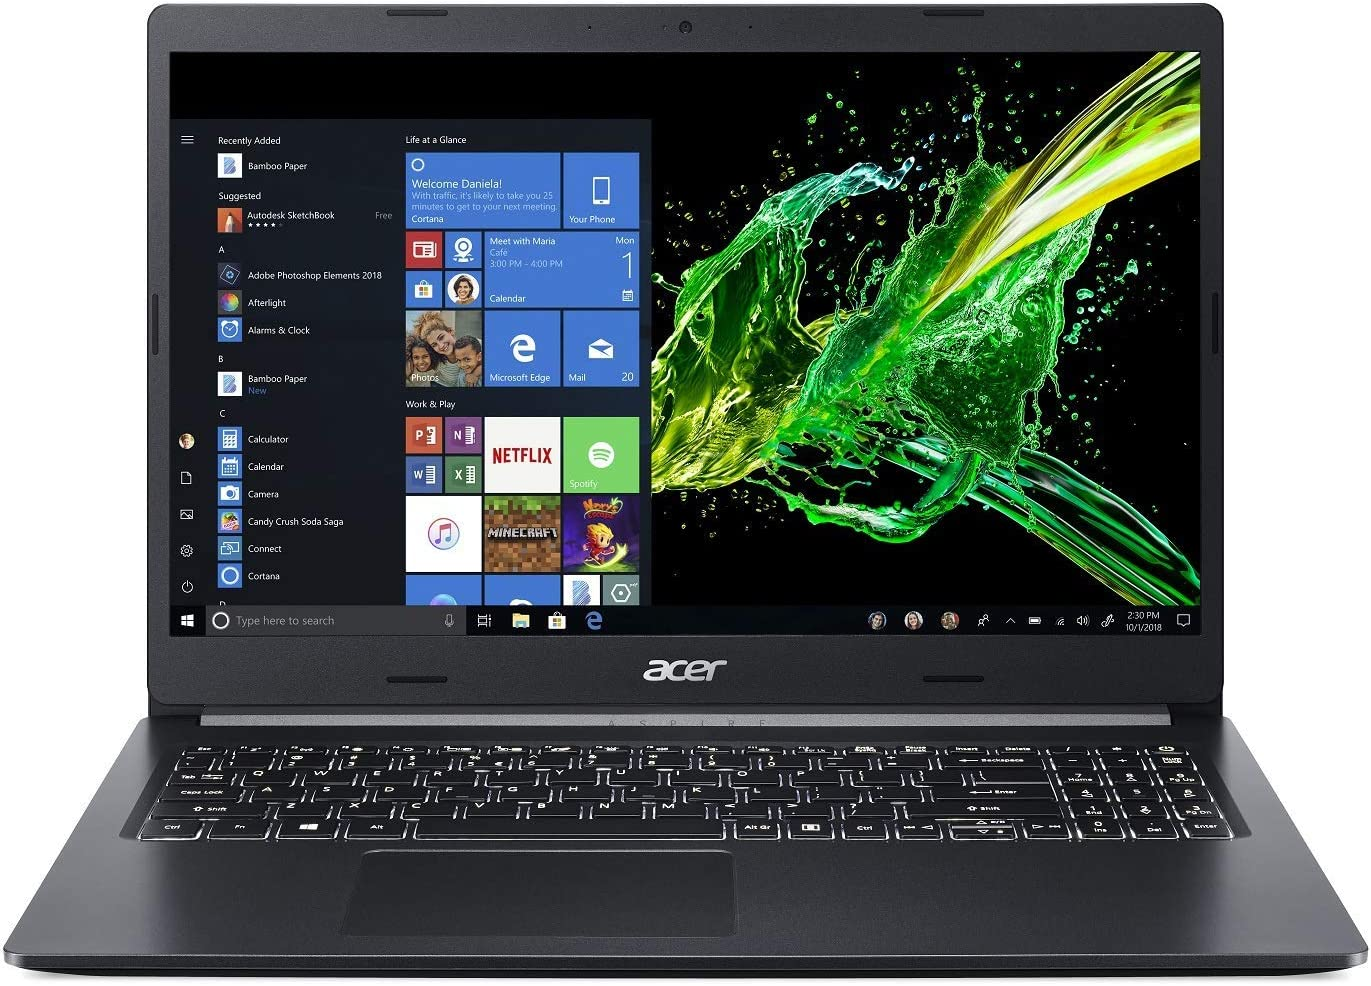 "Acer Aspire 5 Slim Laptop, 15.6"" Full HD IPS Display, 8th Gen Intel Core i7-8565U, NVIDIA GeForce MX250, 12GB DDR4, 512GB PCIe Nvme SSD, Windows 10 Home, A515-54G-73WC (Renewed)"